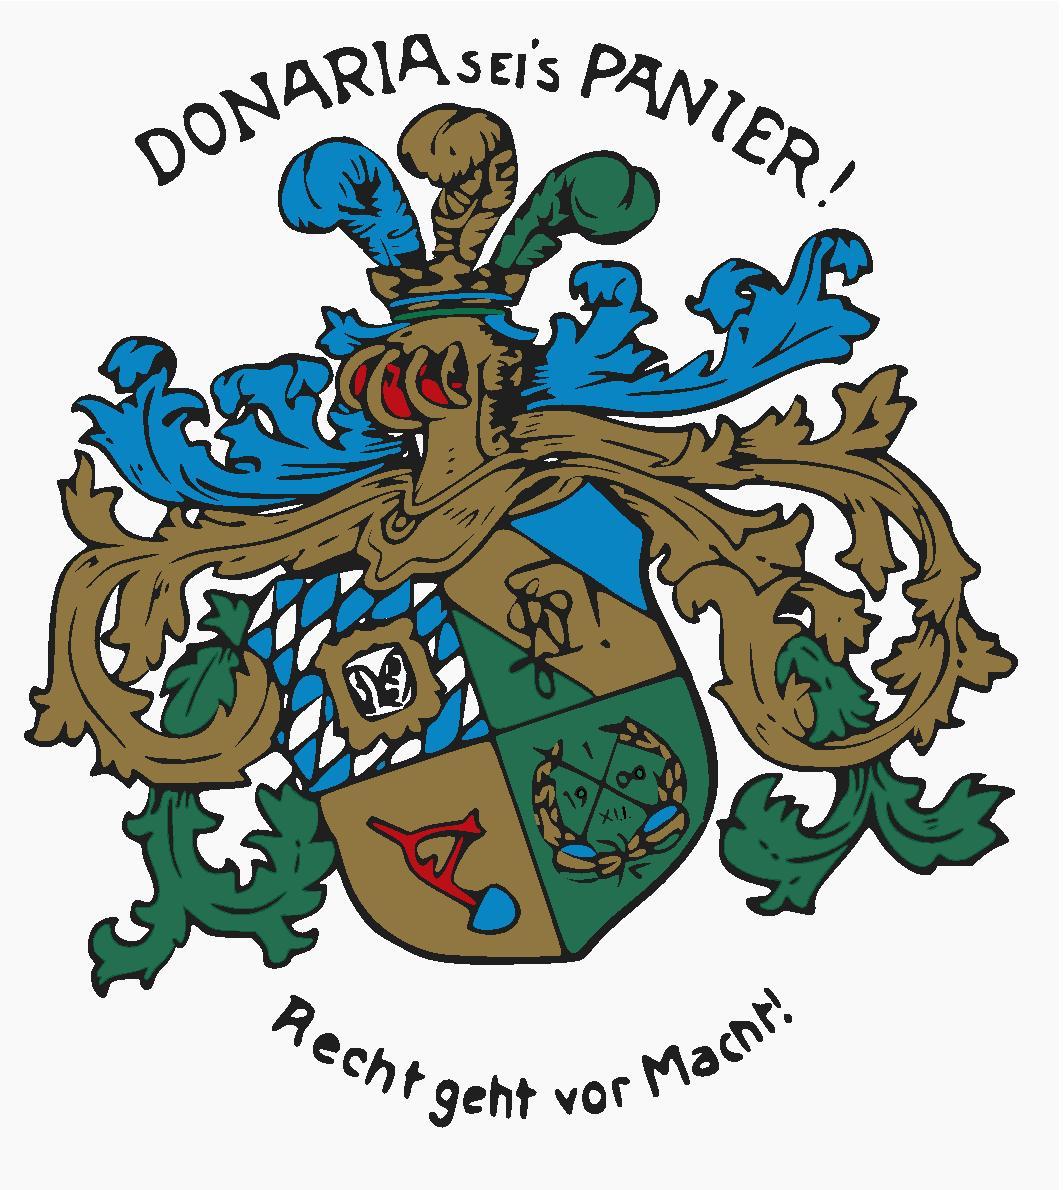 Corps Donaria Zu Freising Weihenstephan Wikipedia